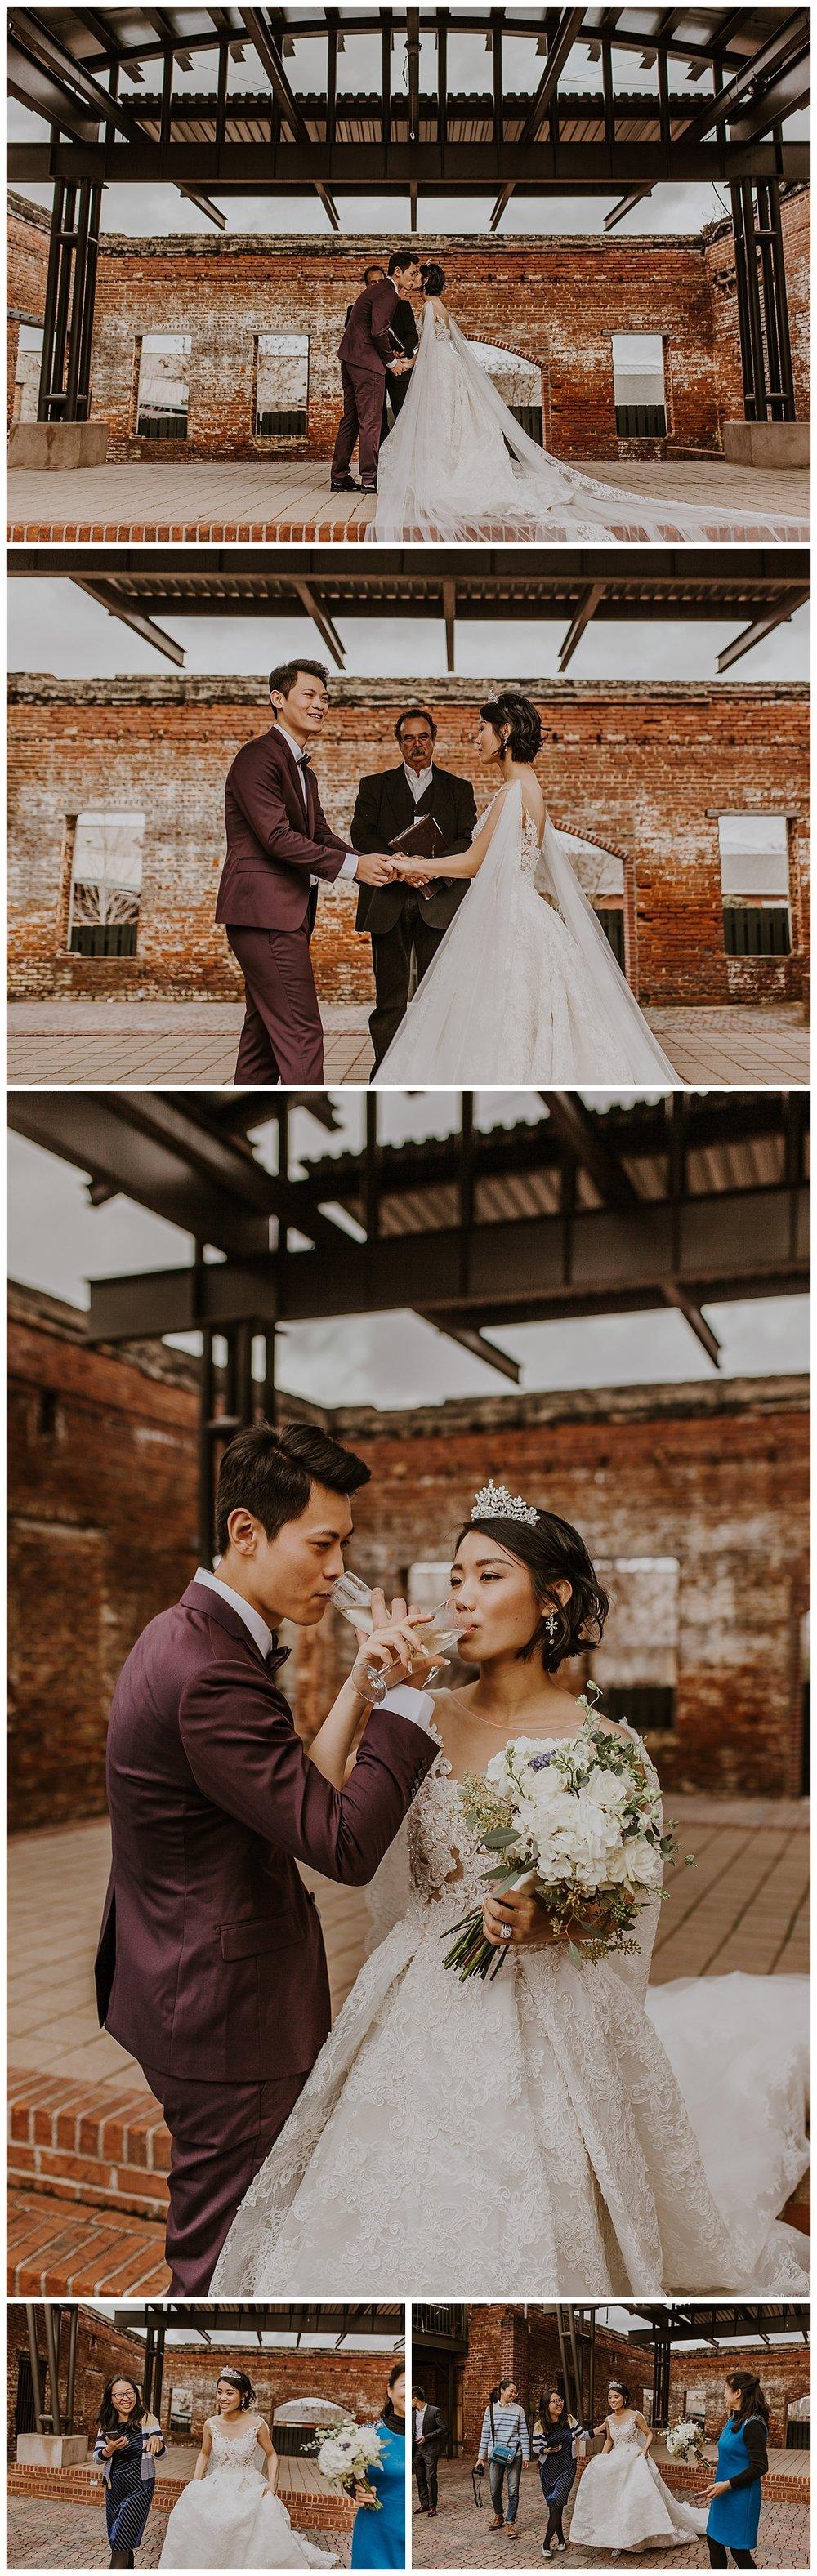 DOUGLASVILLE_GEORGIA_WEDDING_PHOTOGRAPHER_ELOPEMENT_ATLANTA_NATURAL_LIGHT_MOODY_SUNNY_0007.jpg